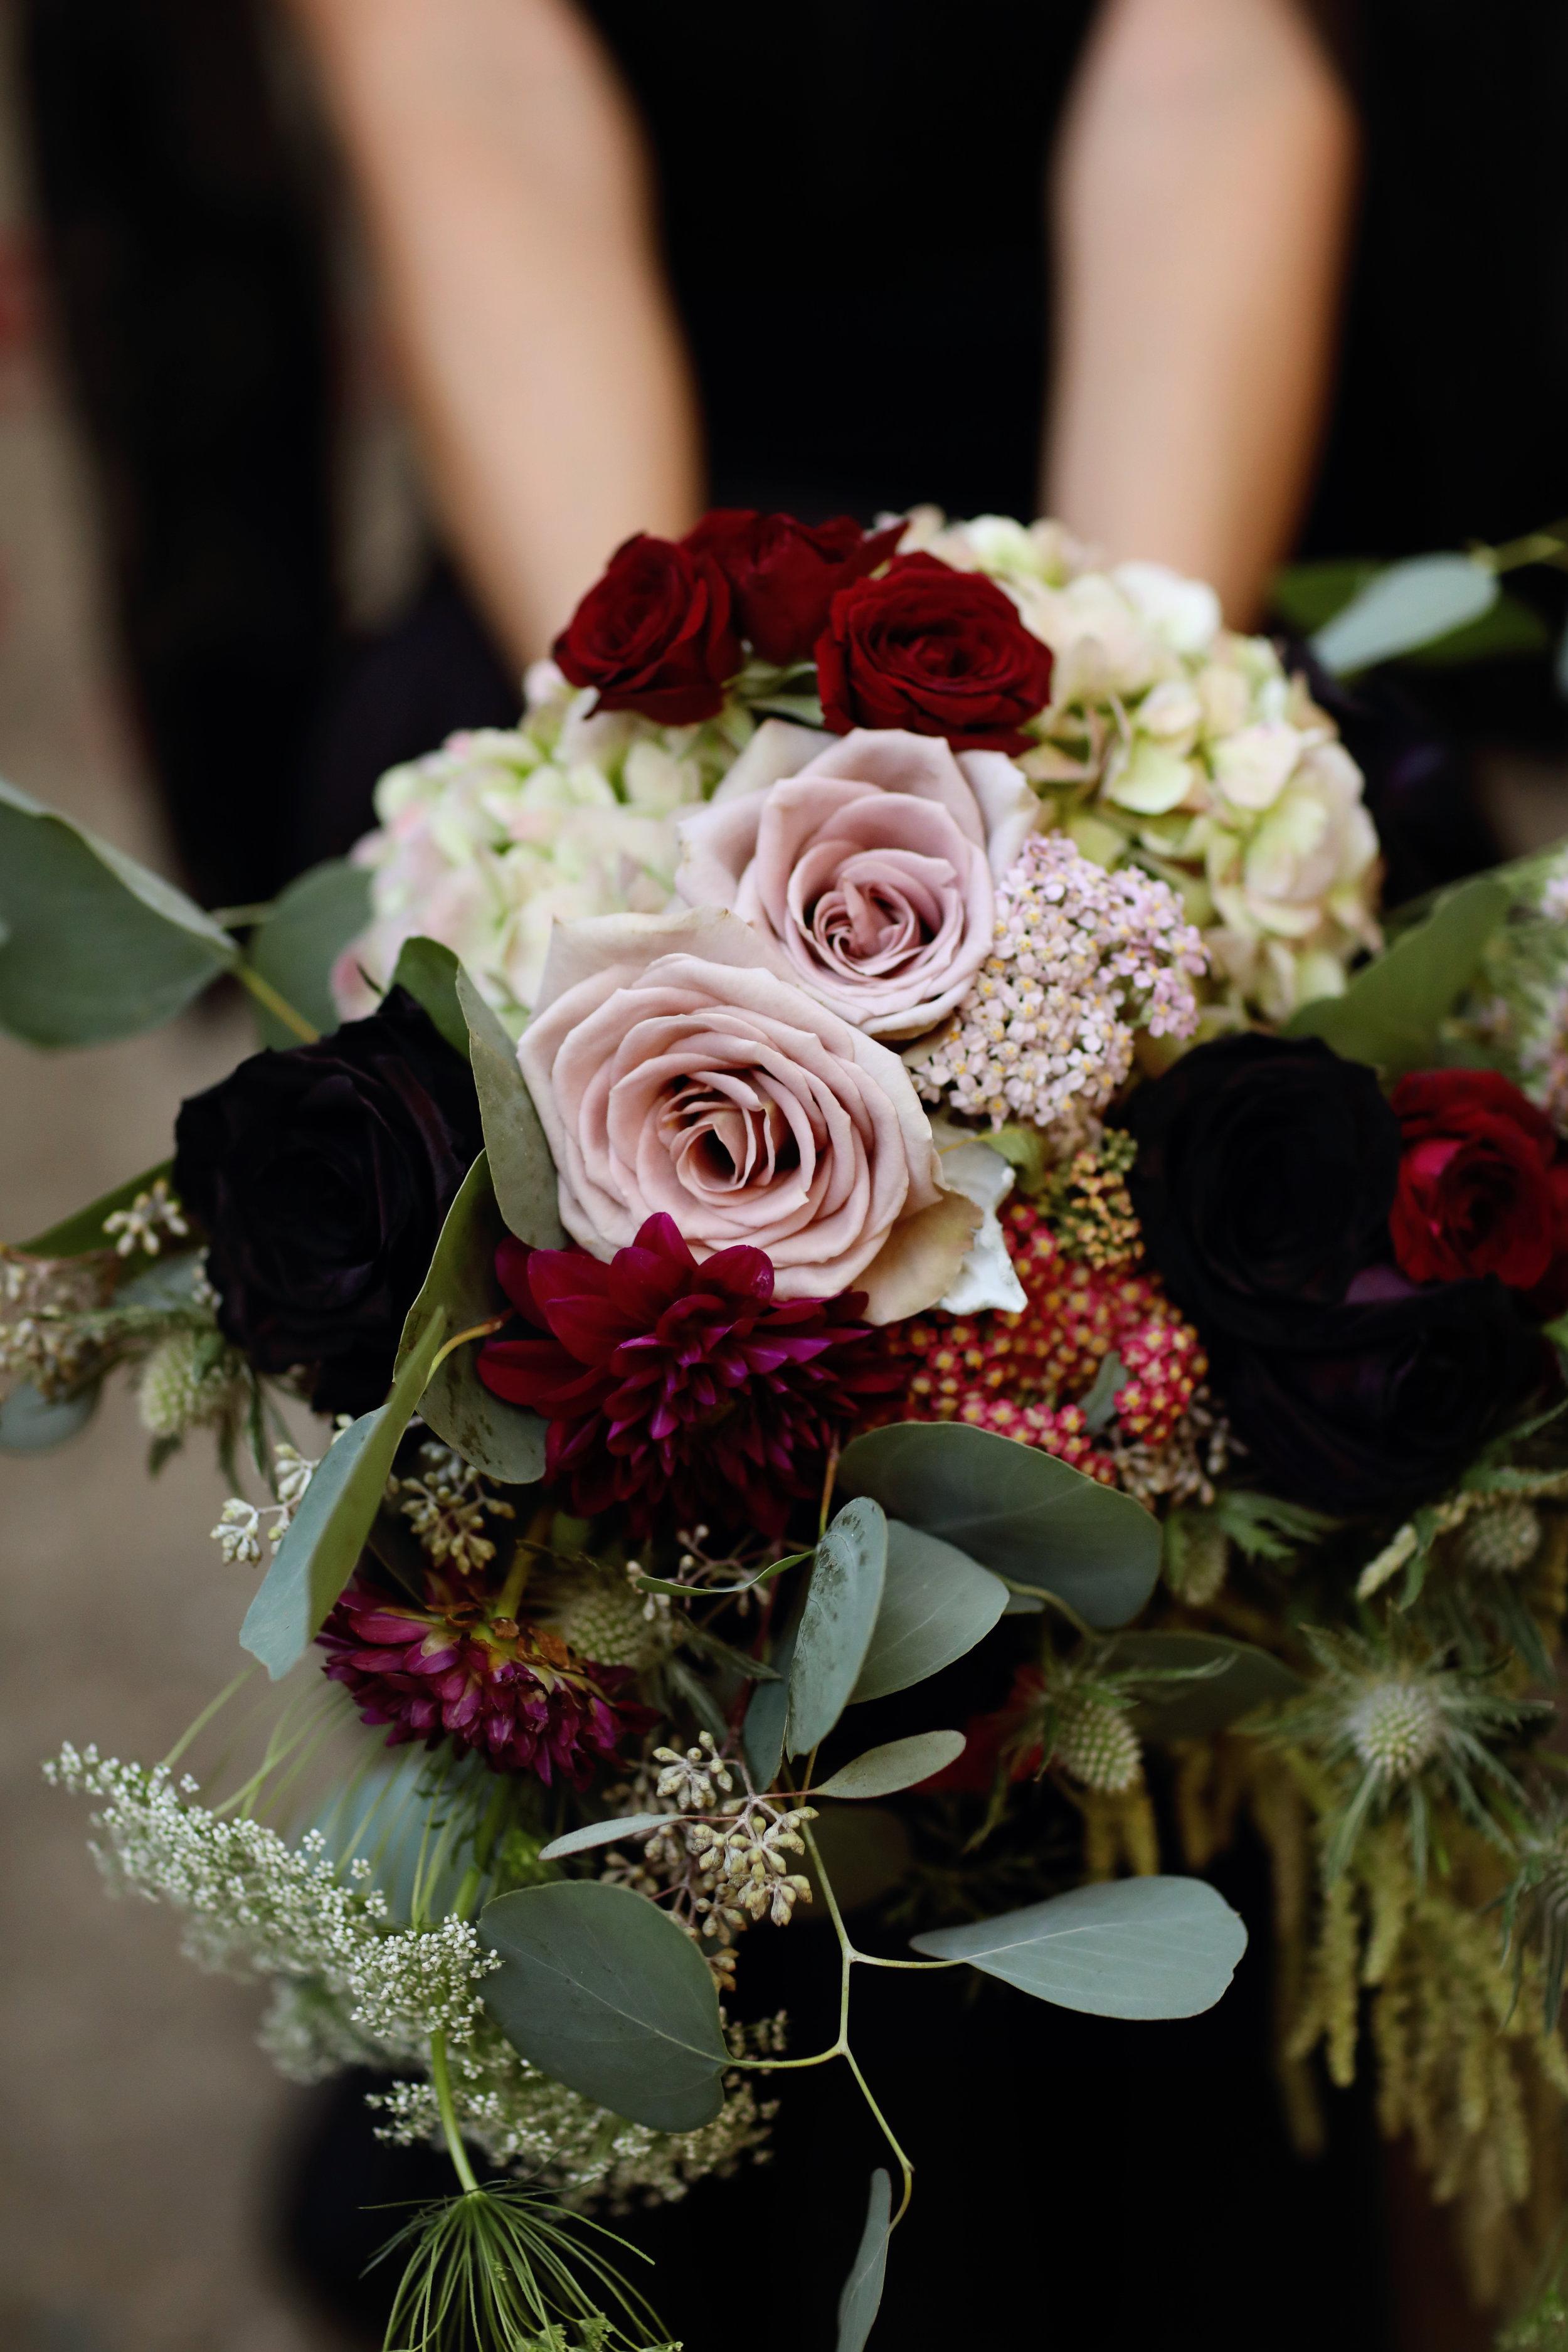 Brides bouquet Sith black dahlias, thistle, roses, and seeded eucalyptus